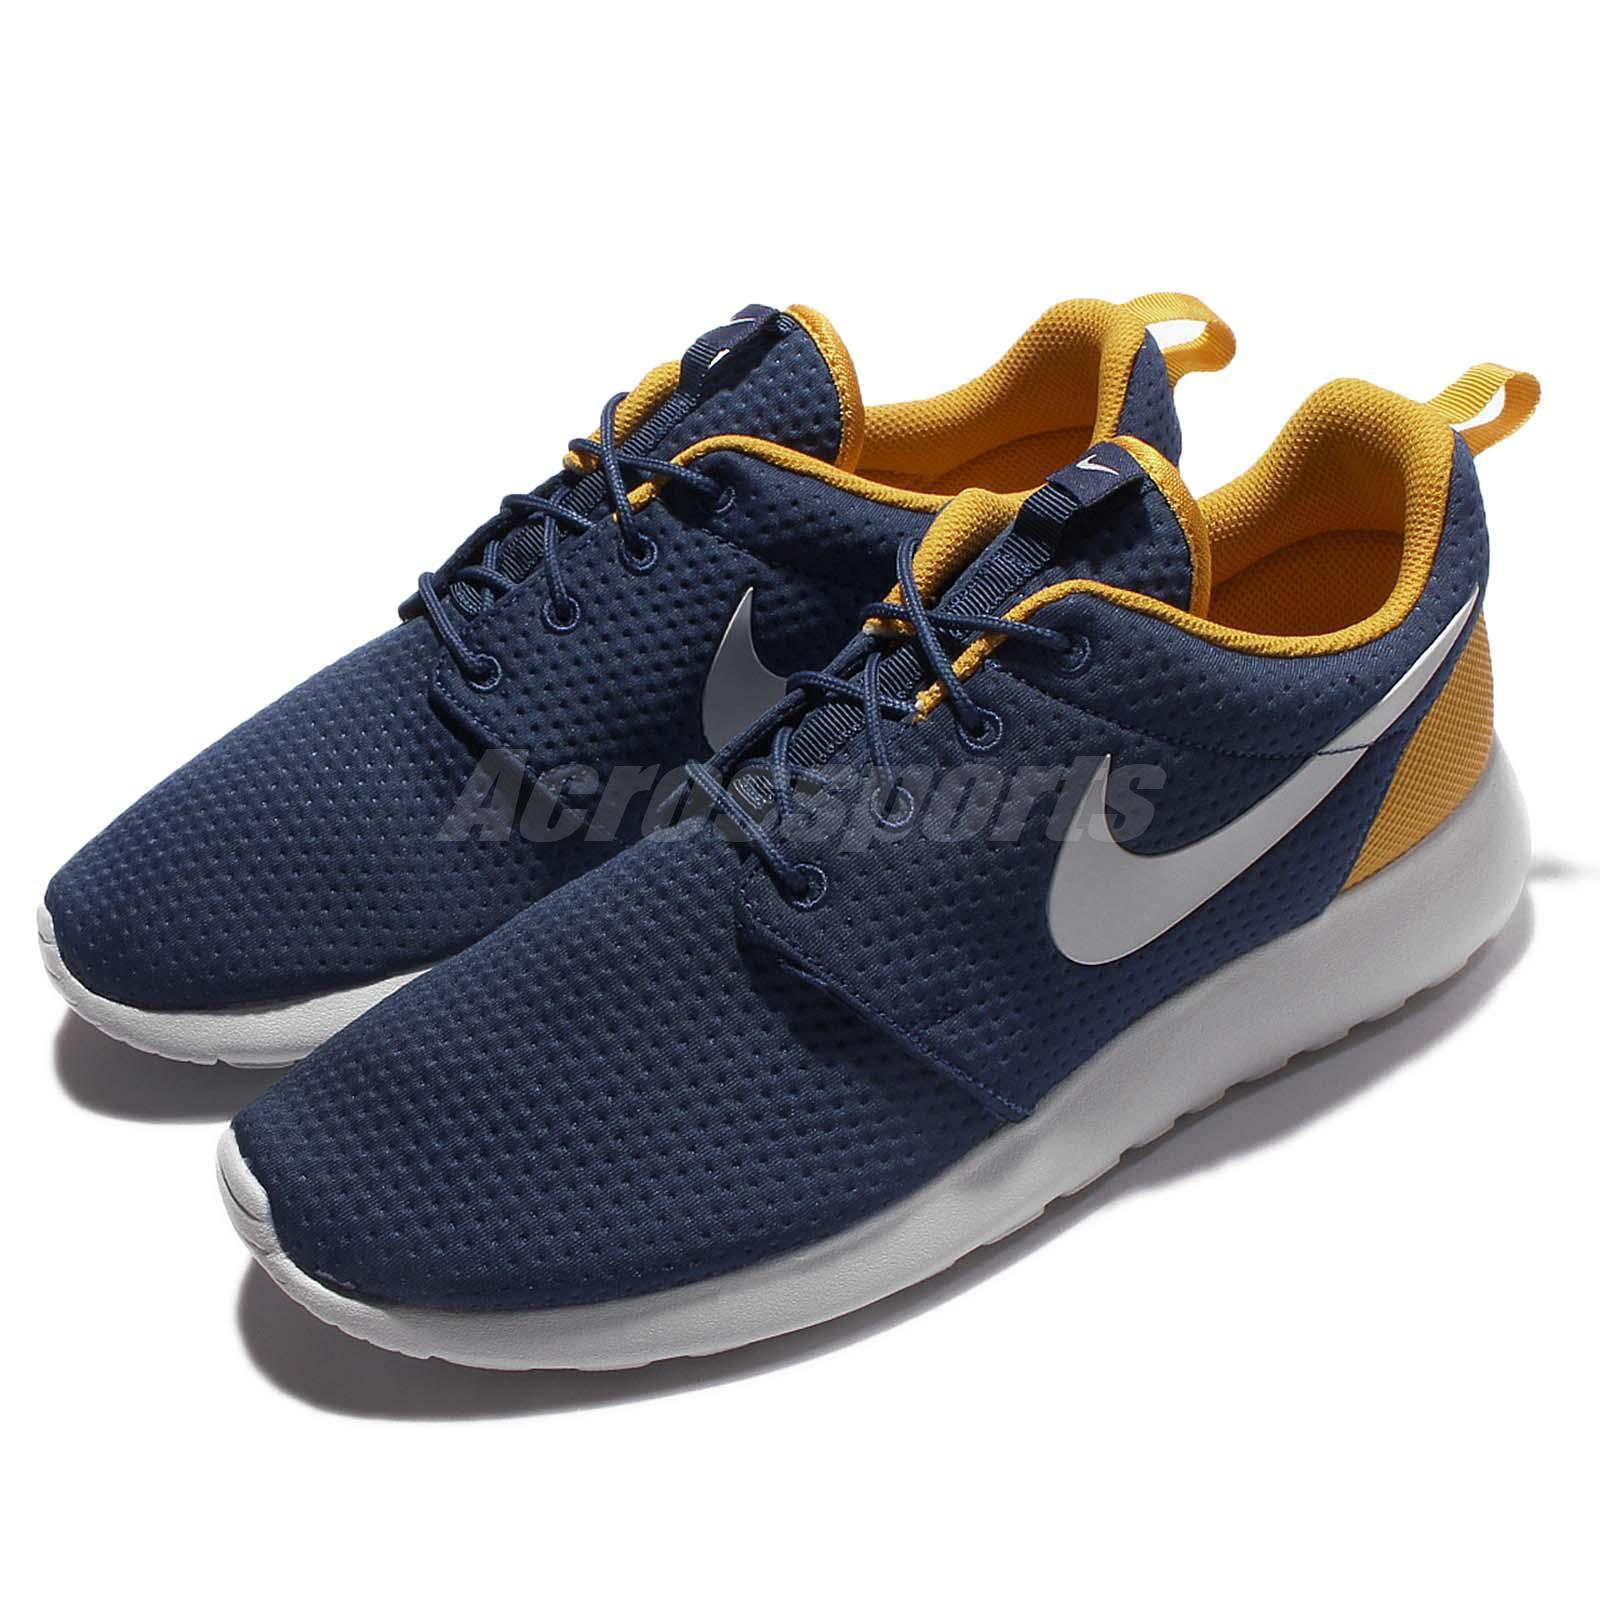 8eb877a322df2 Nike Free Run 3.0 V4 Custom Nike Free Run 3 0 V5